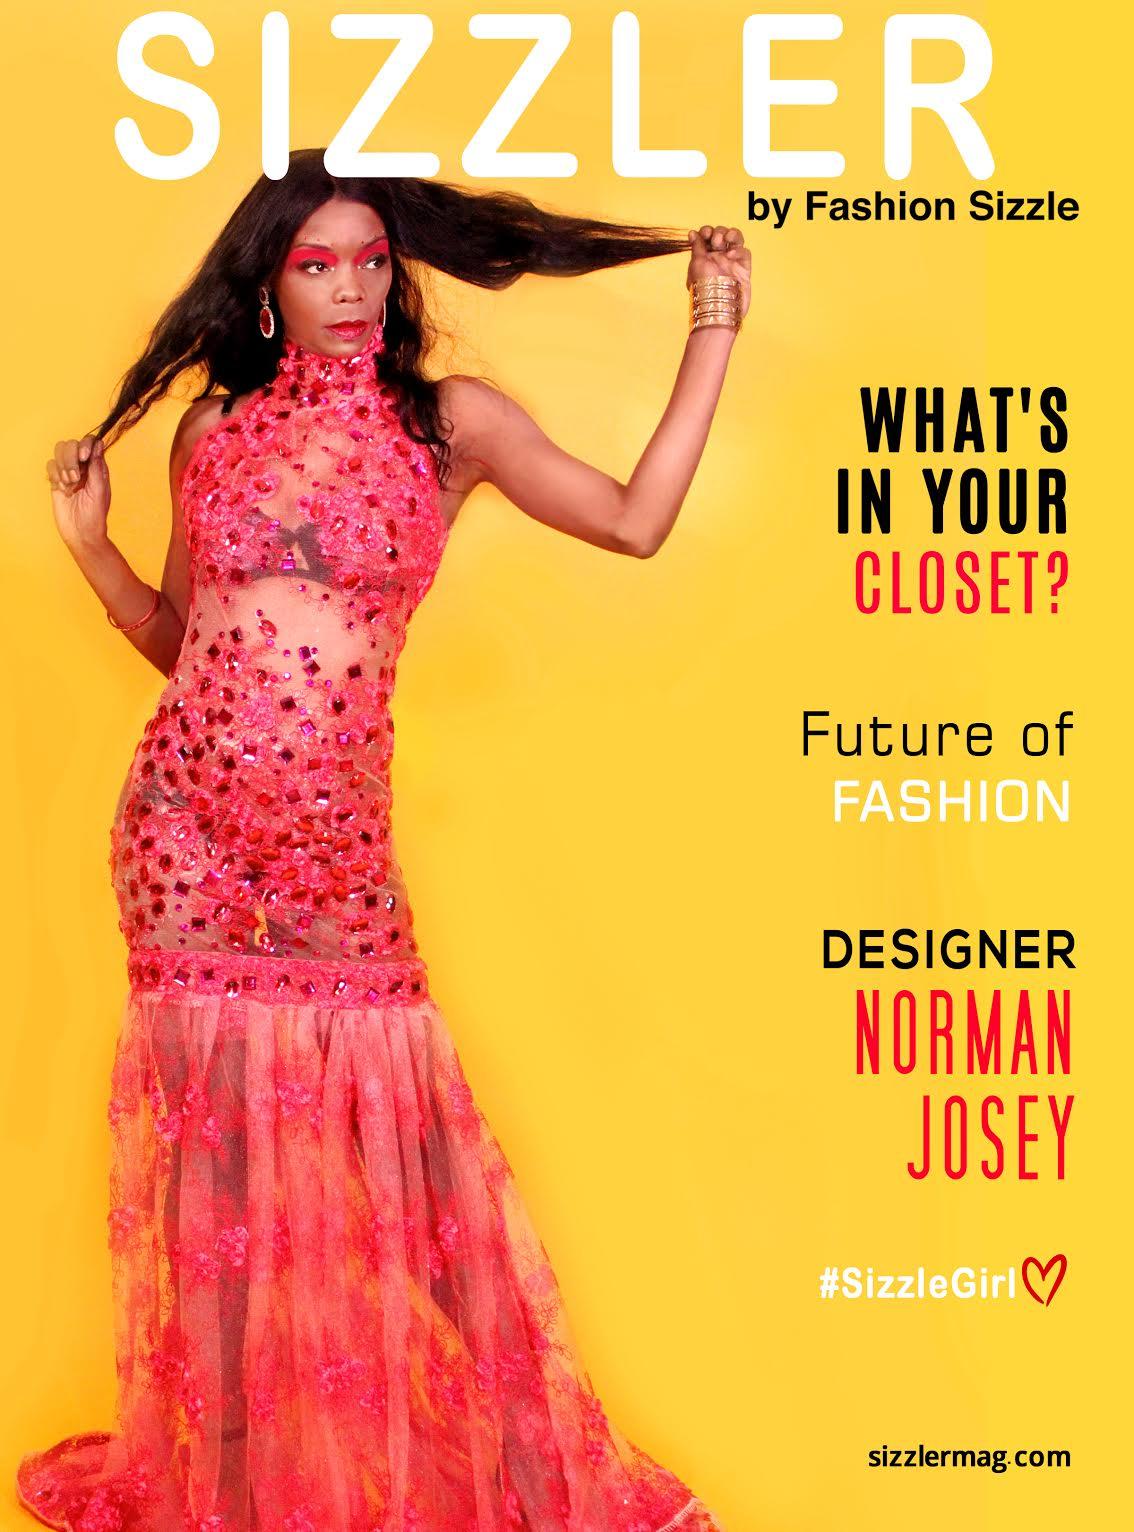 NORMAN JOSEY Of Lockdown International Designs @ Fashion Sizzle NYFW